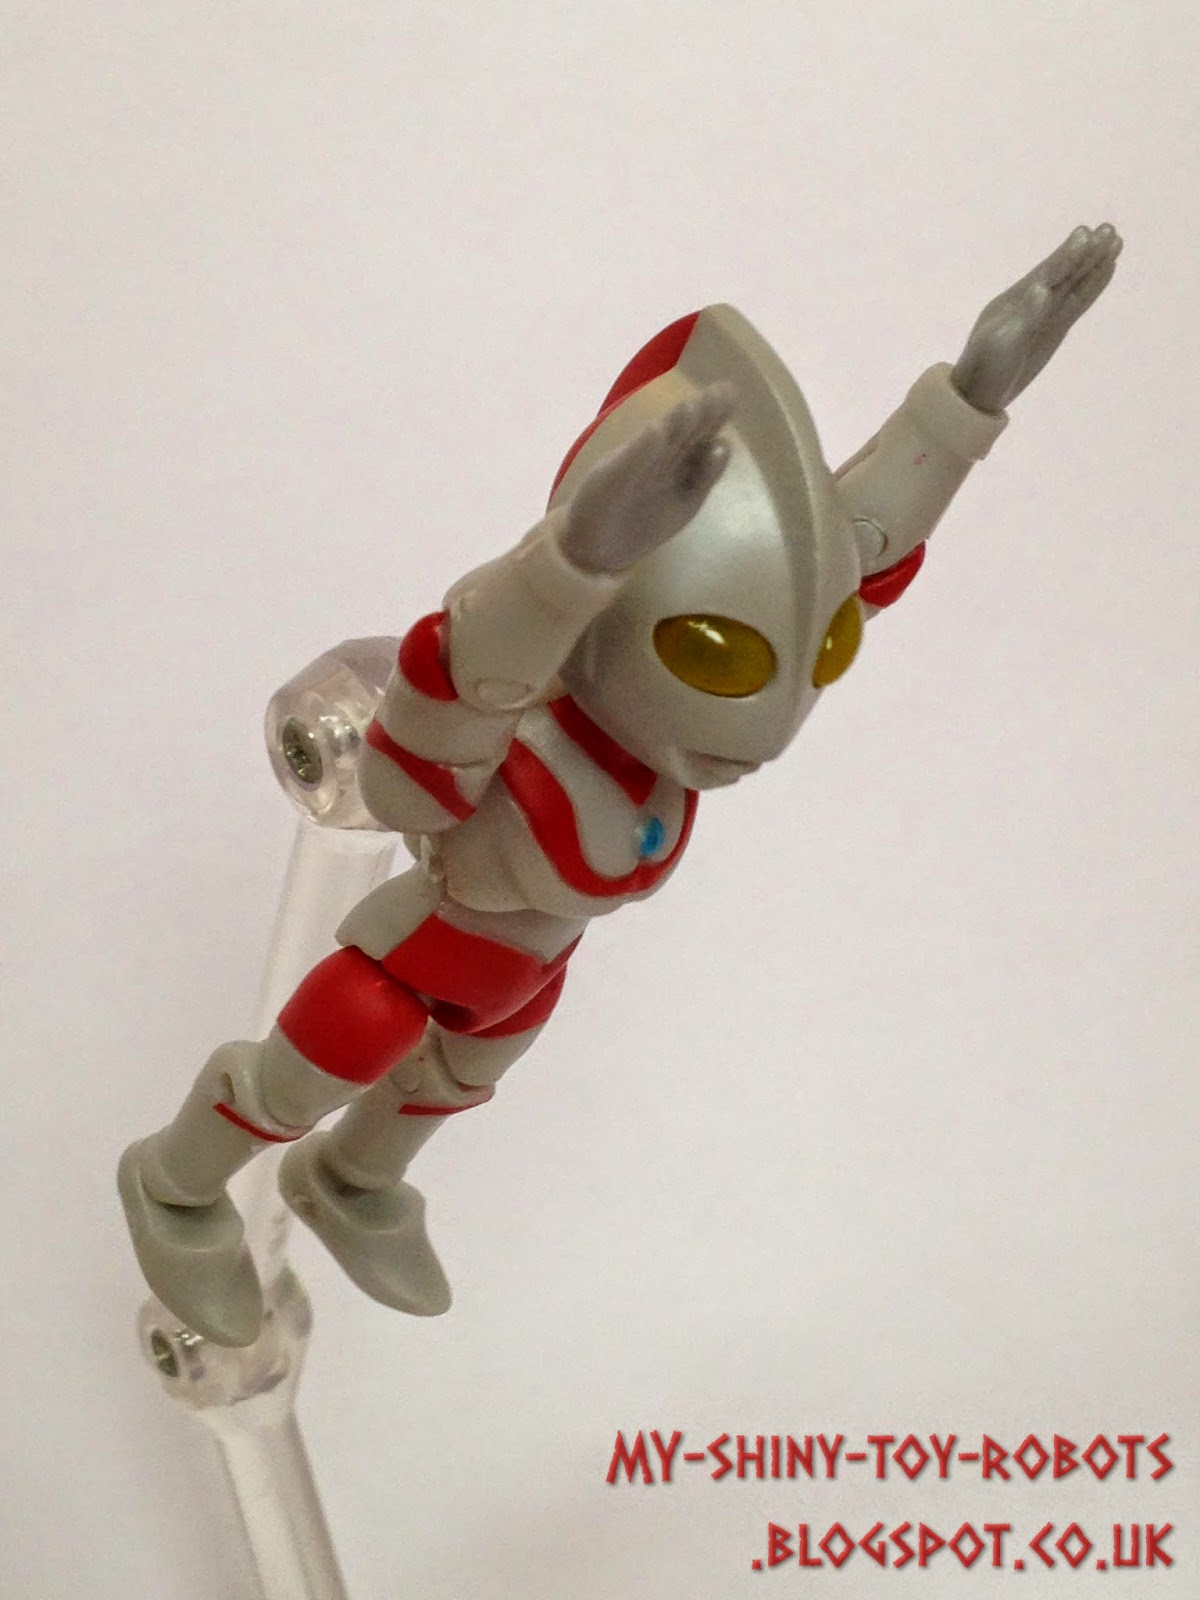 Ultraman takes flight